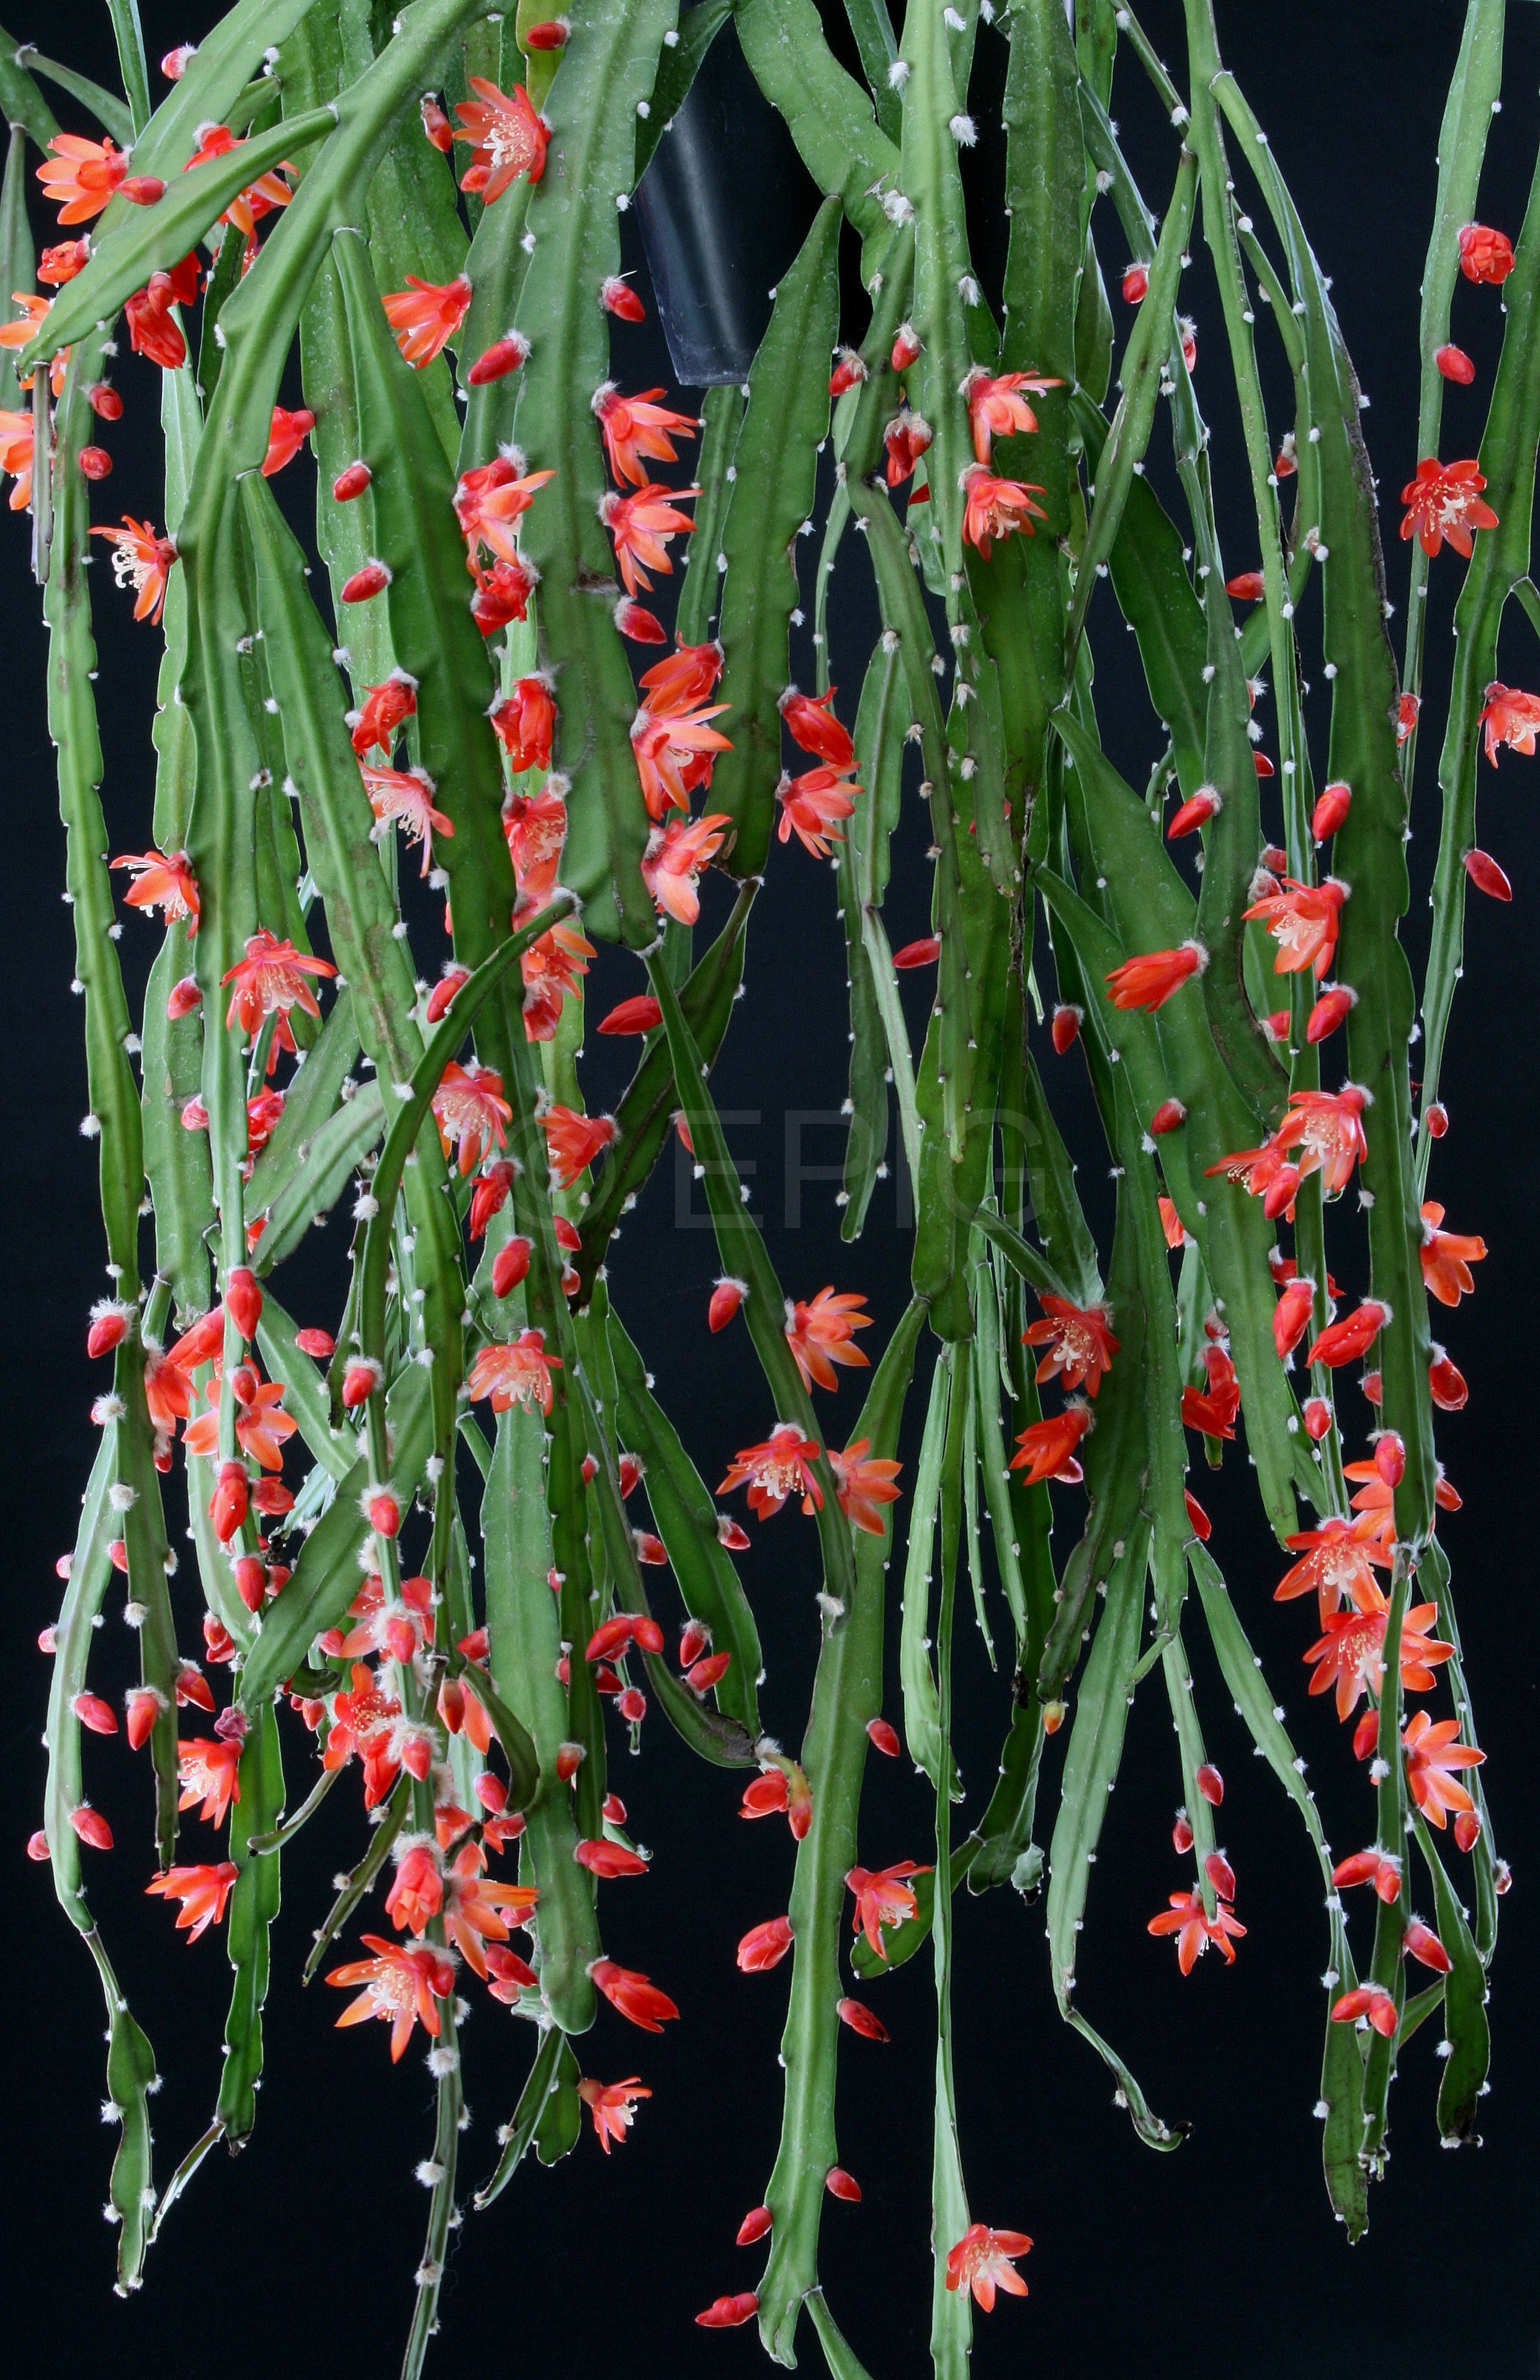 Pfeiffera asuntapatensis WK970 (Foto Jochen Bockemühl)